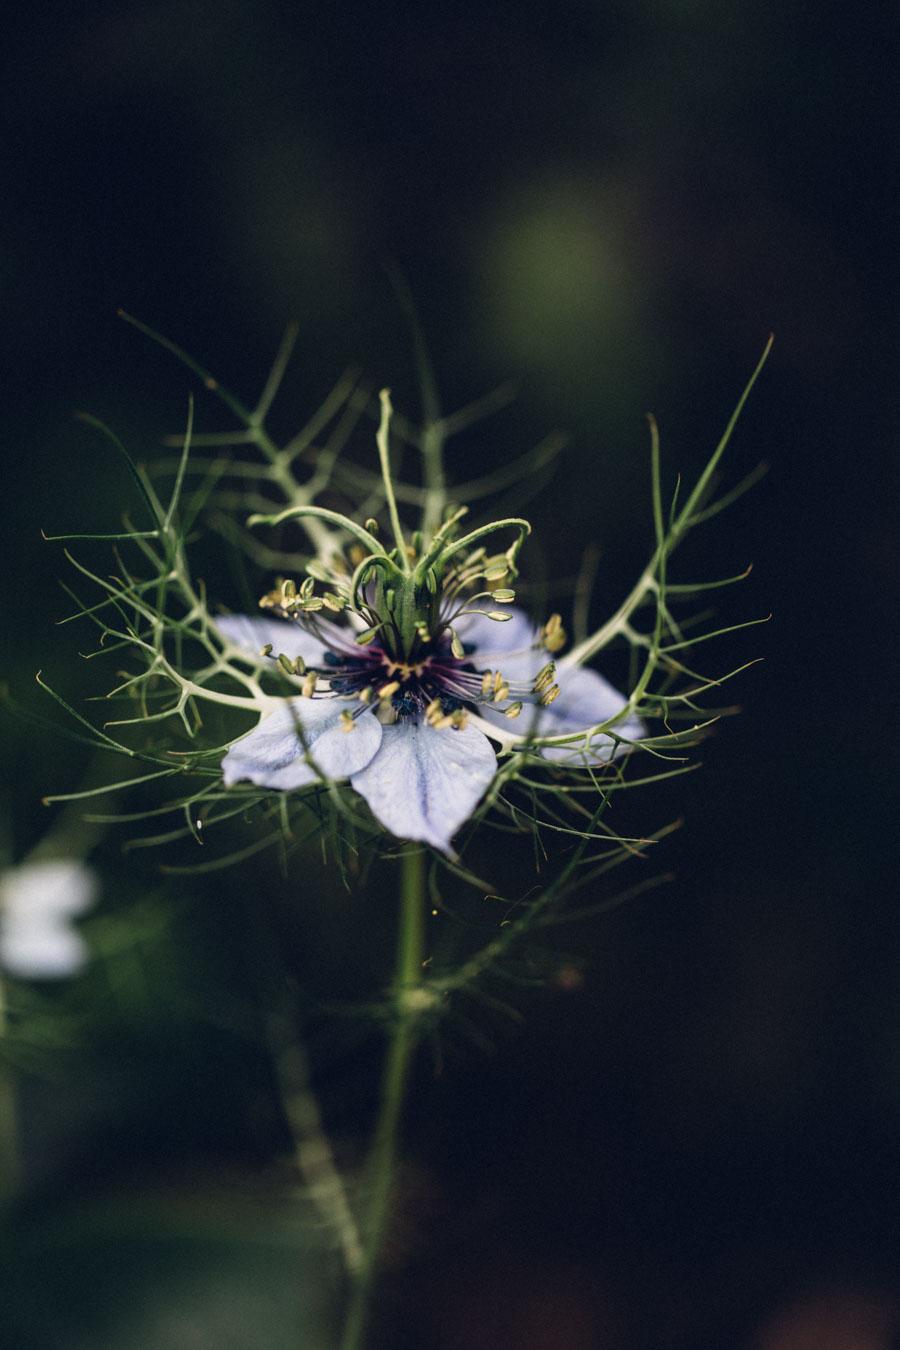 Nigella flowers